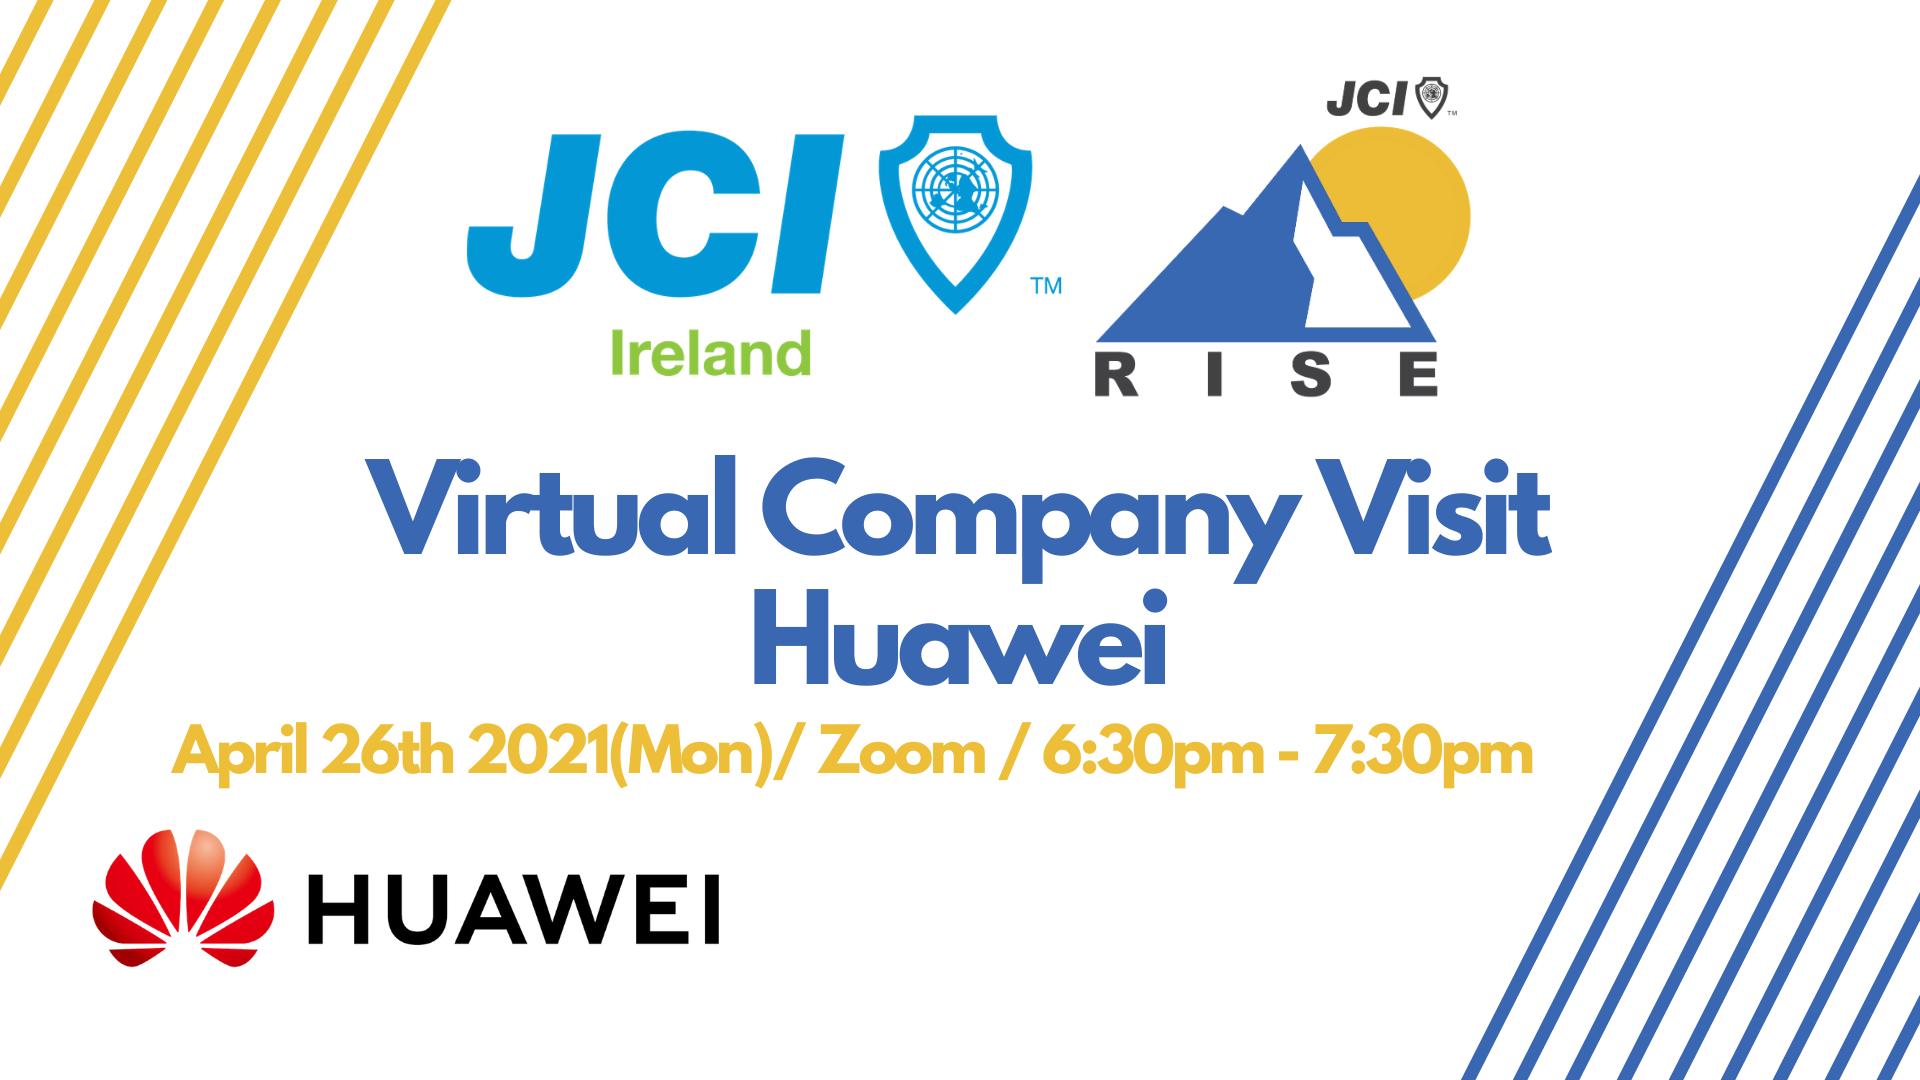 Virtual Company Visit - Huawei